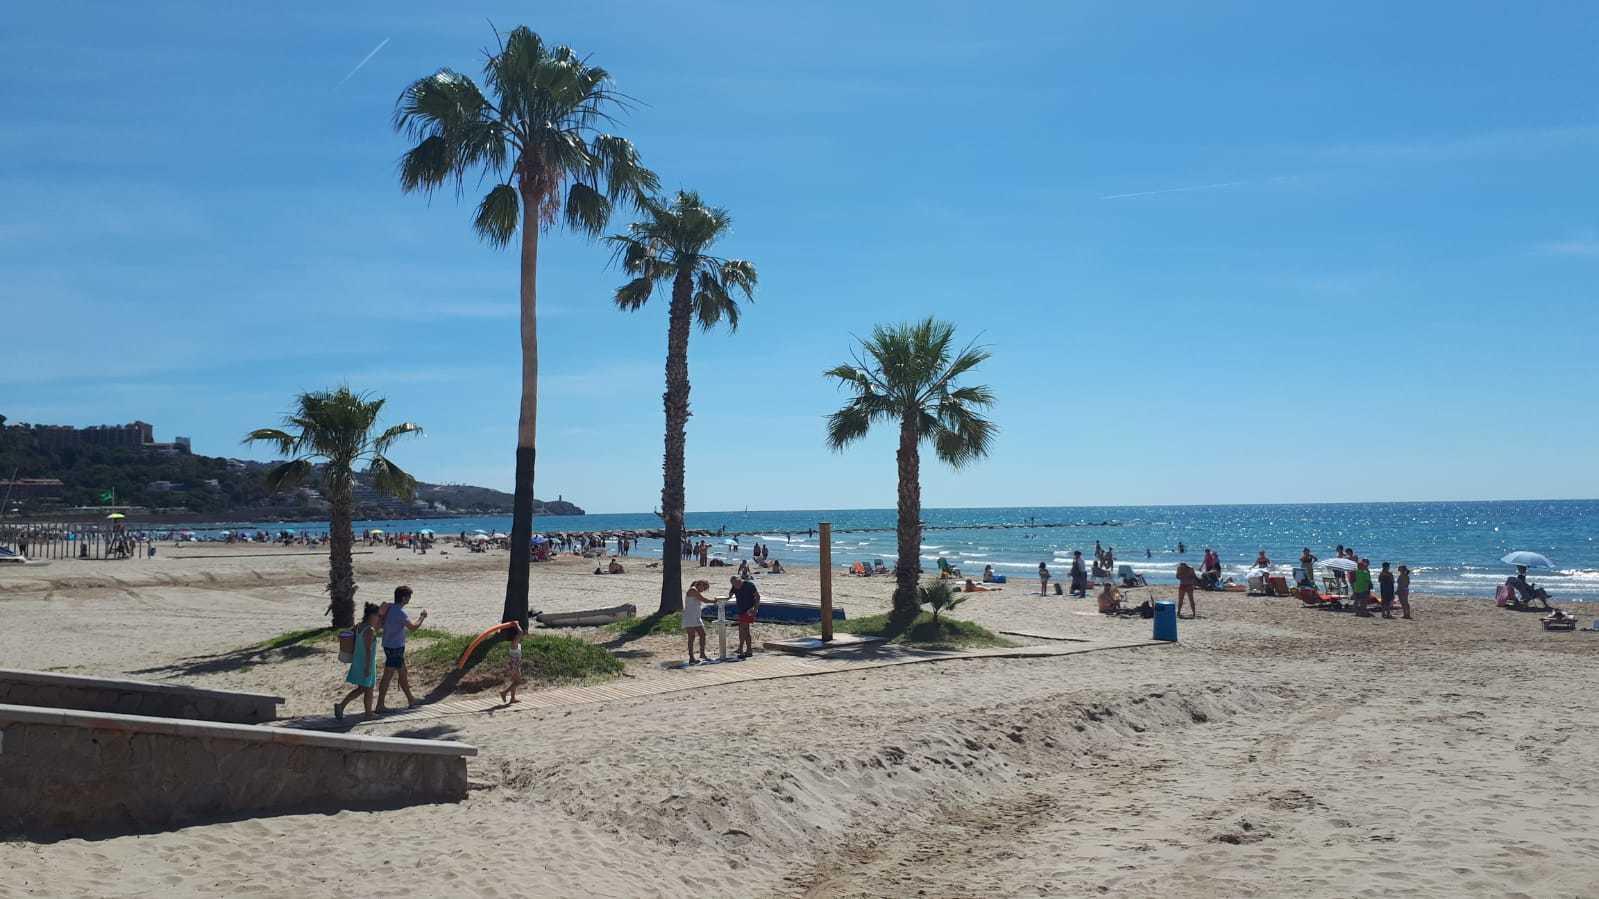 Playa L'Almadrava